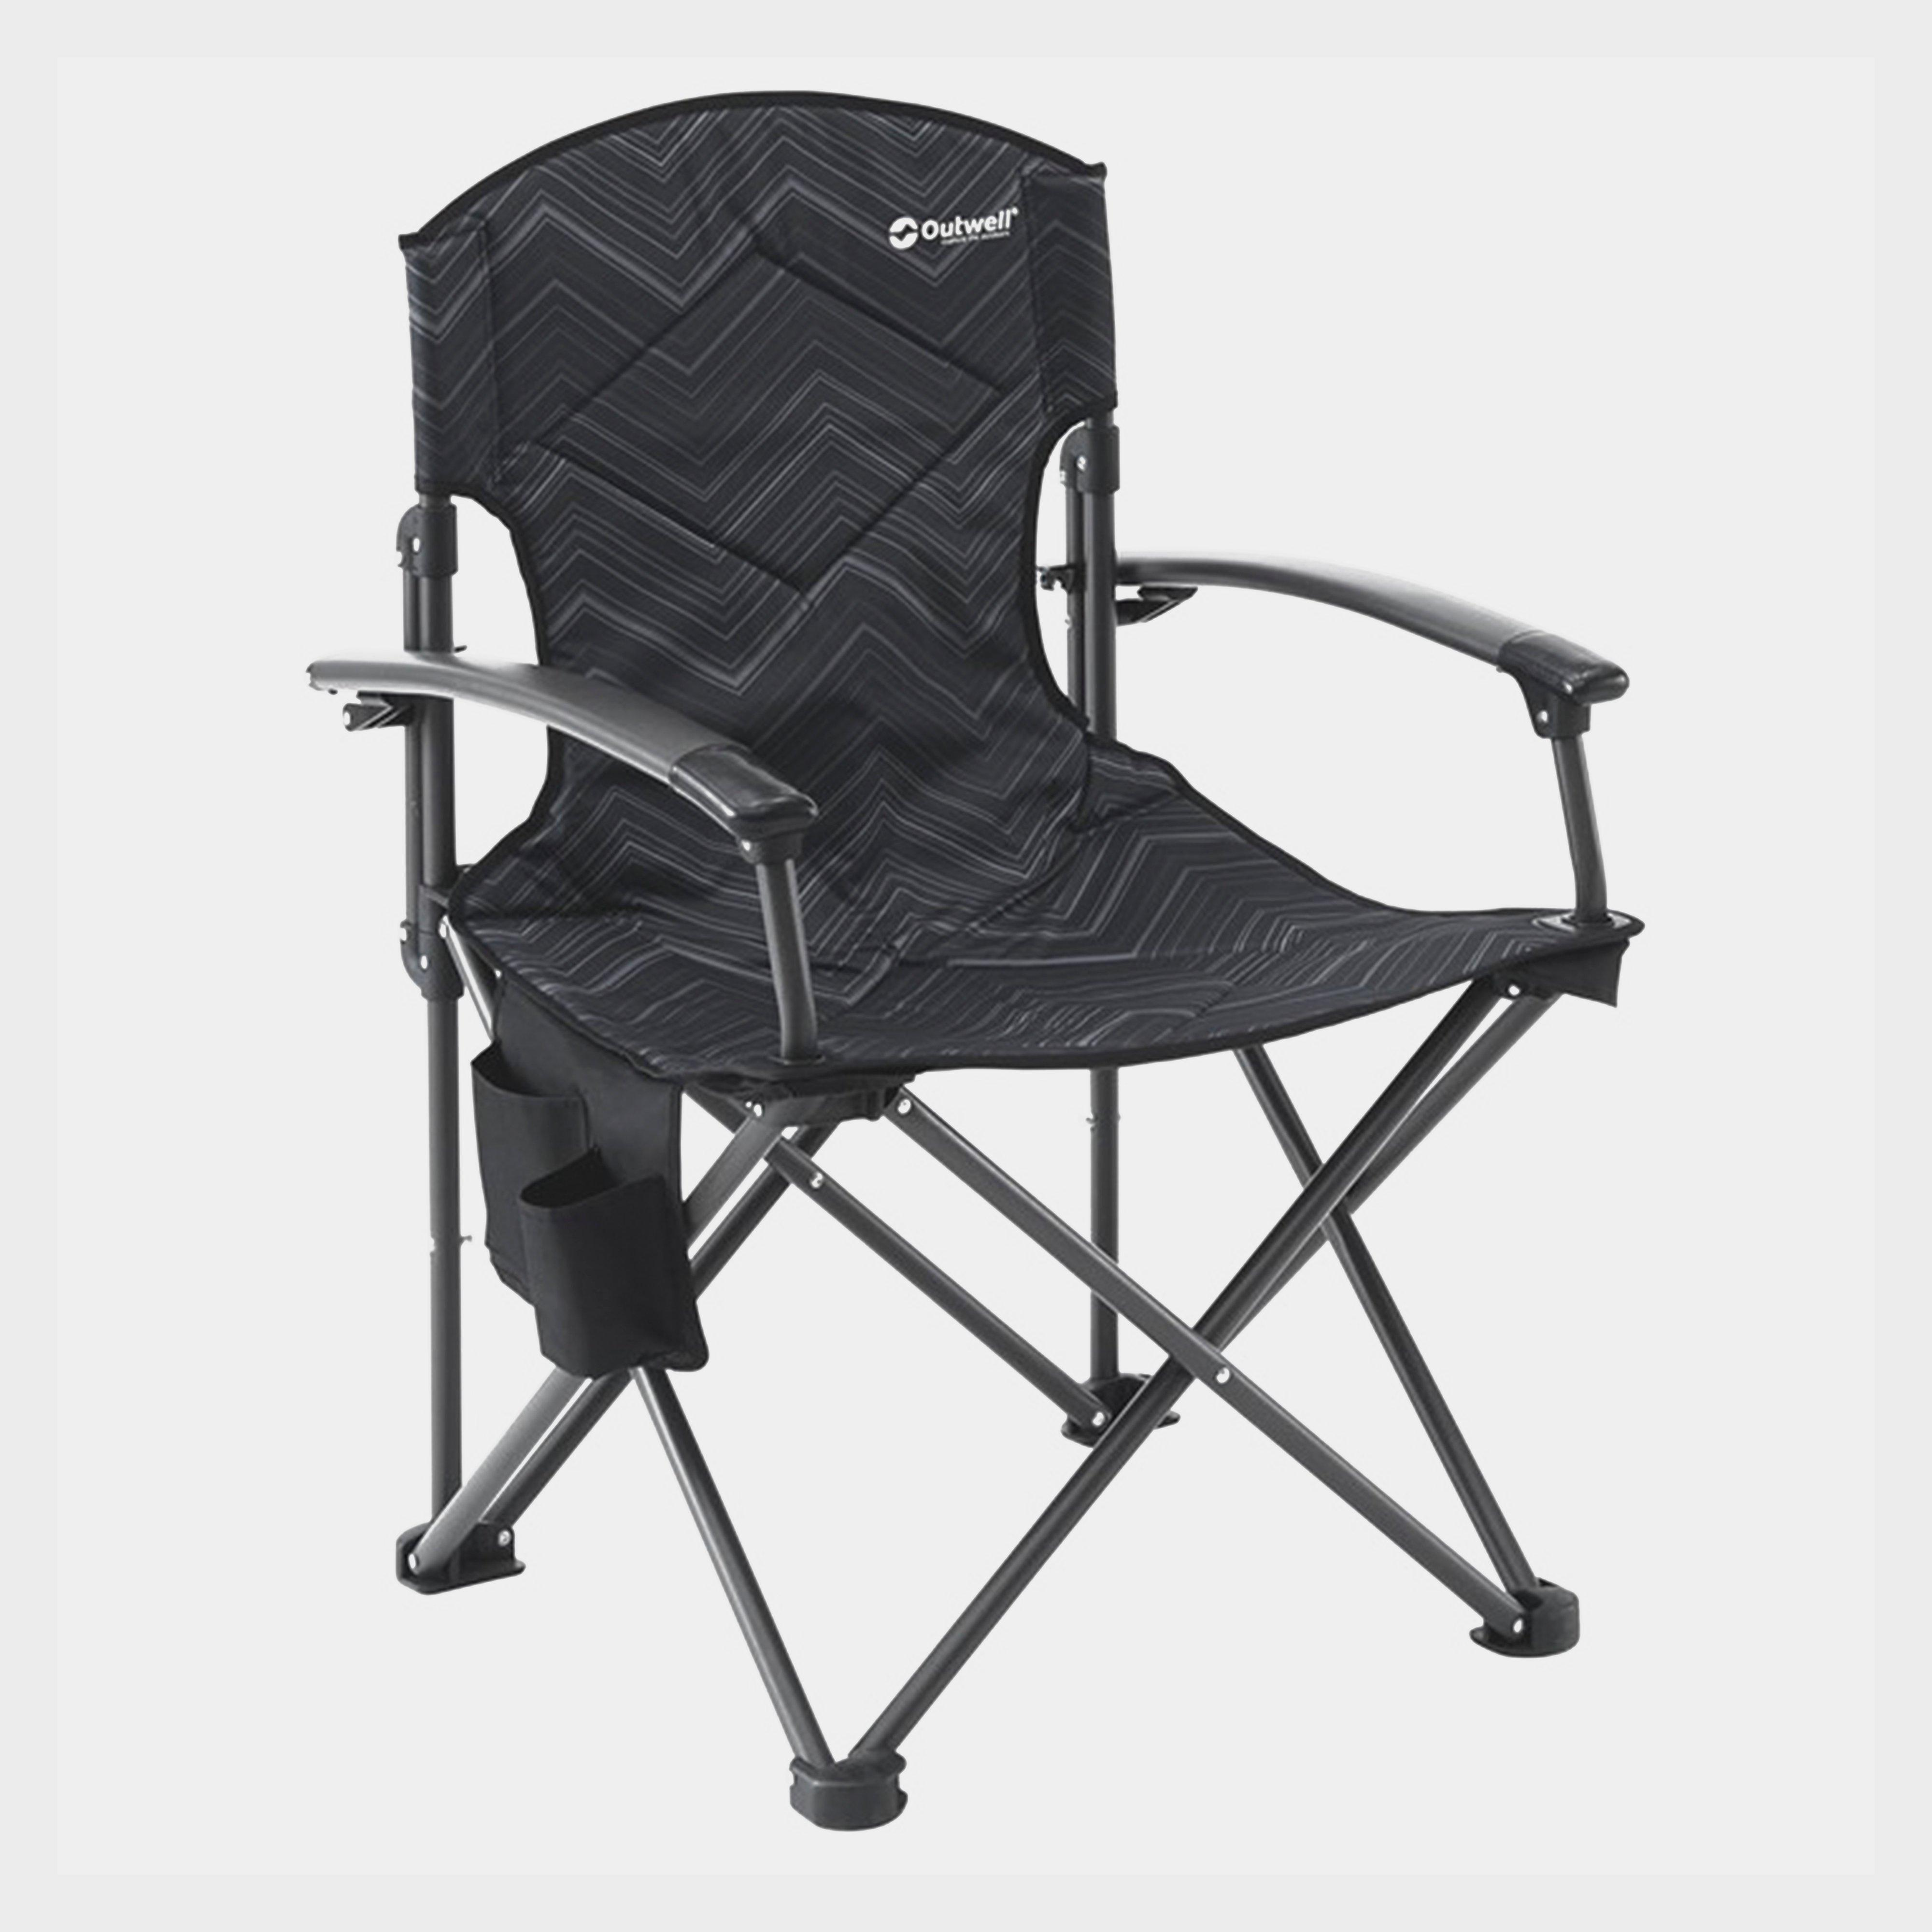 Outwell Fountain Hills Chair - Black, Black